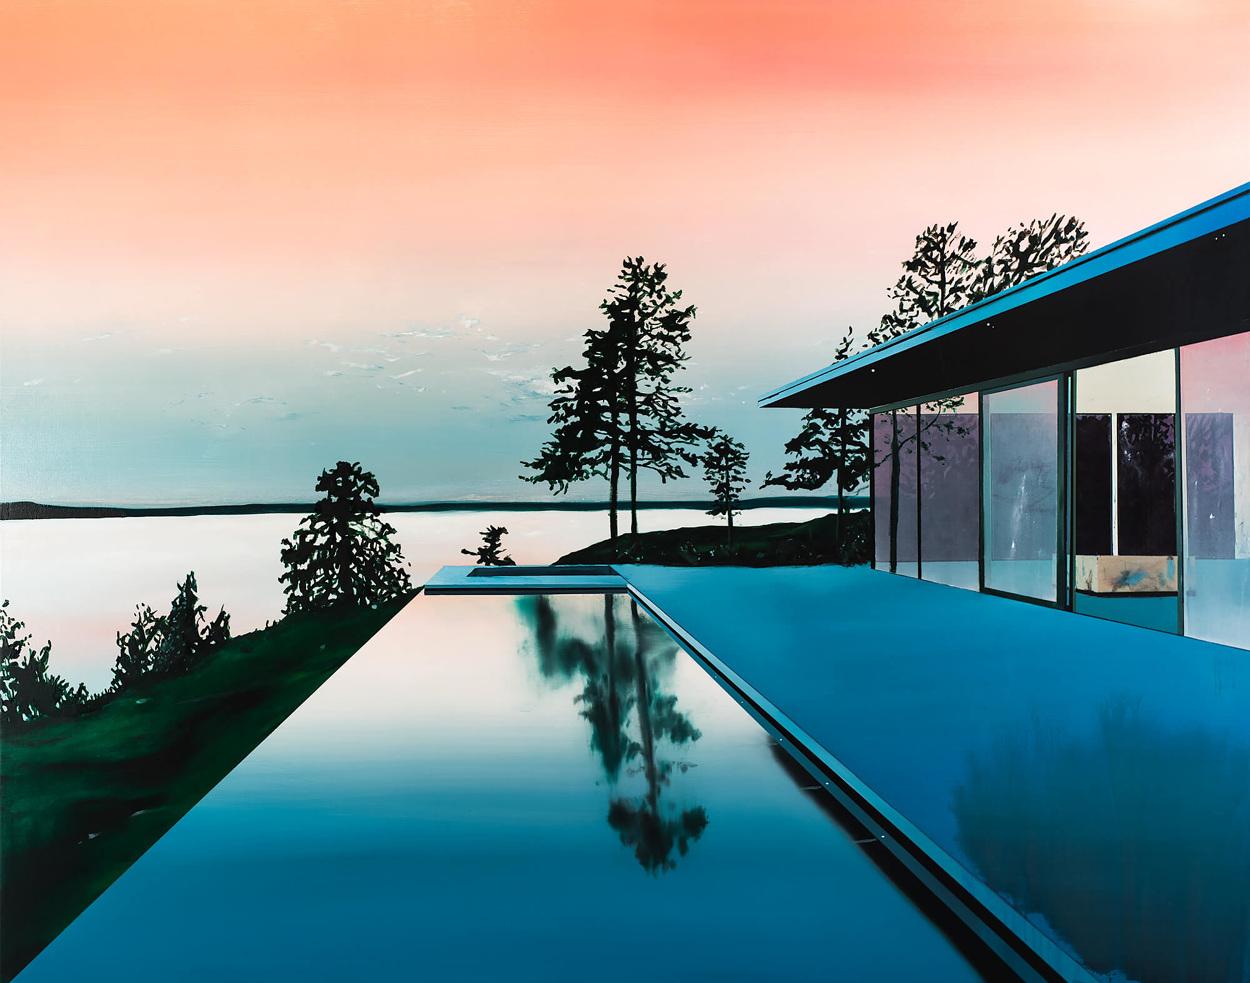 Infinity-Pool--185x145cm--mixed-media-on-linen--2016-1_1250.jpg